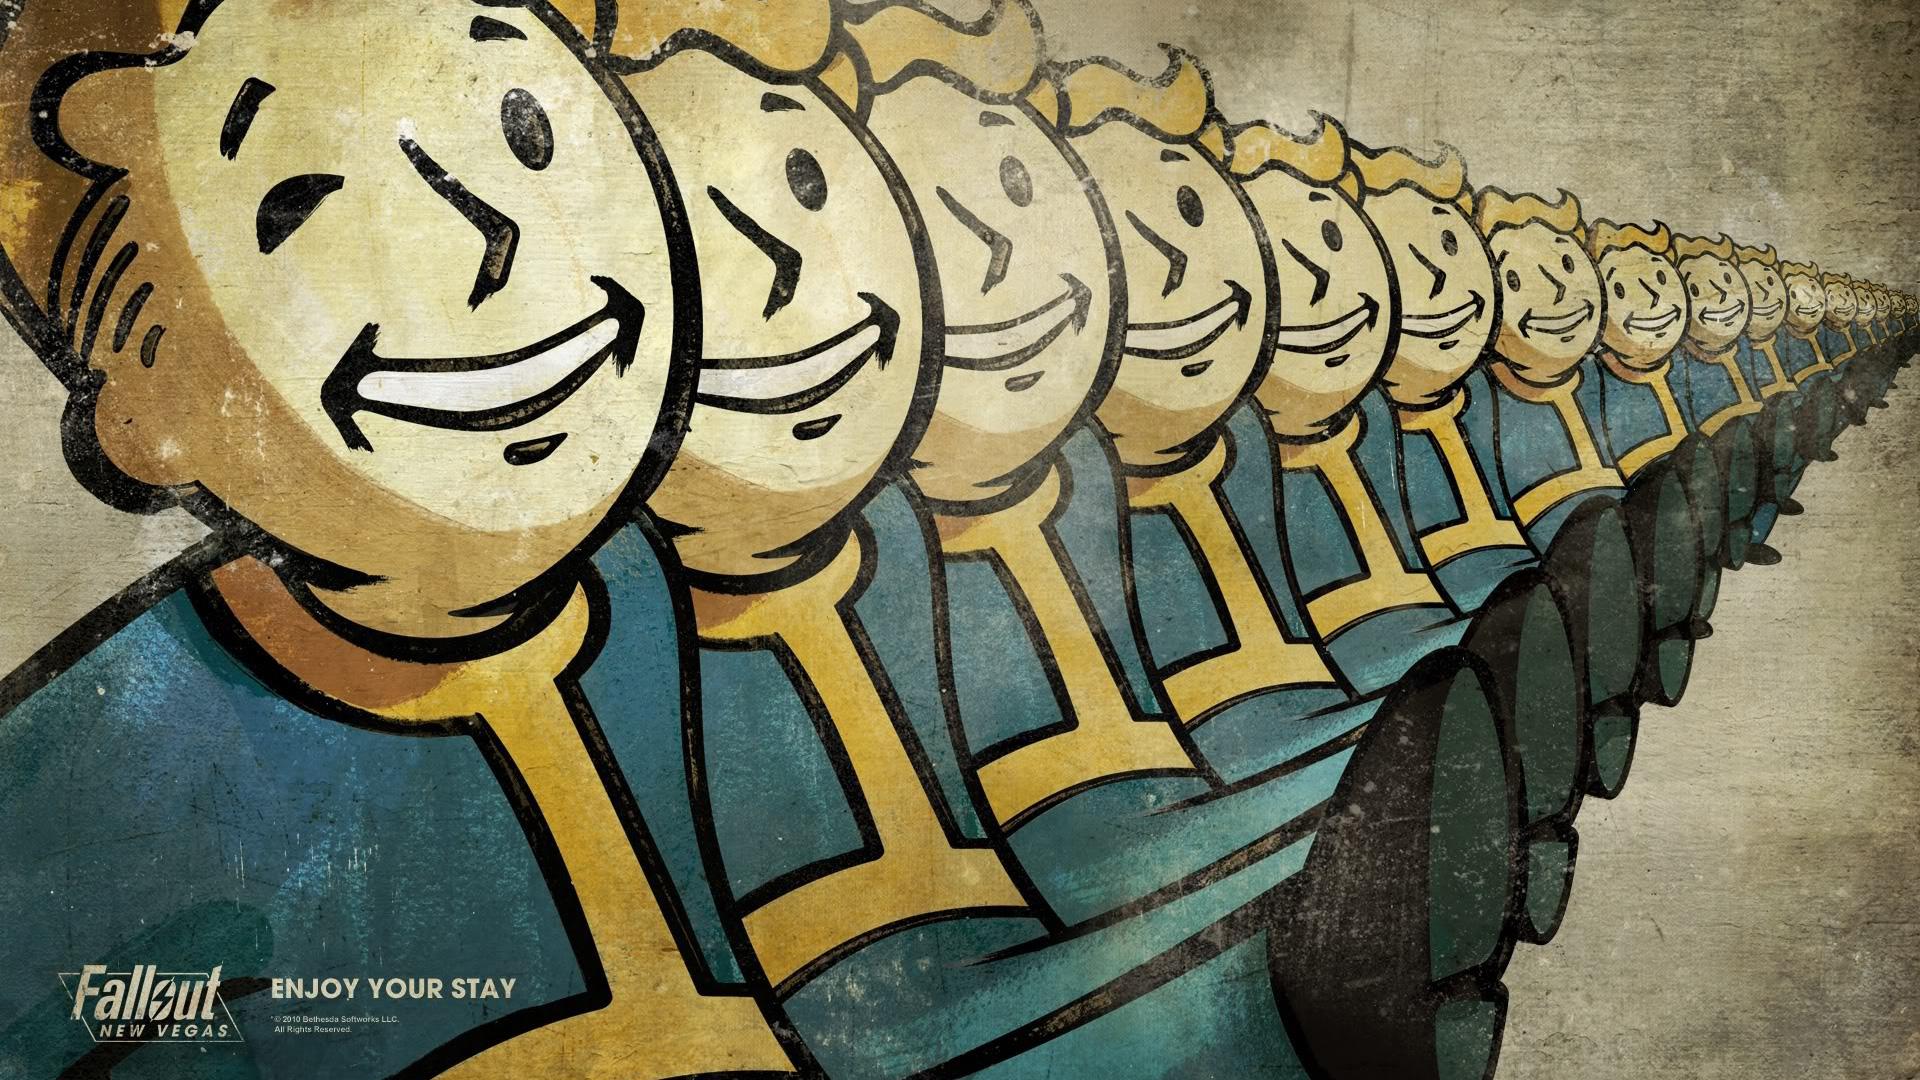 Fallout: New Vegas Wallpaper in 1920x1080